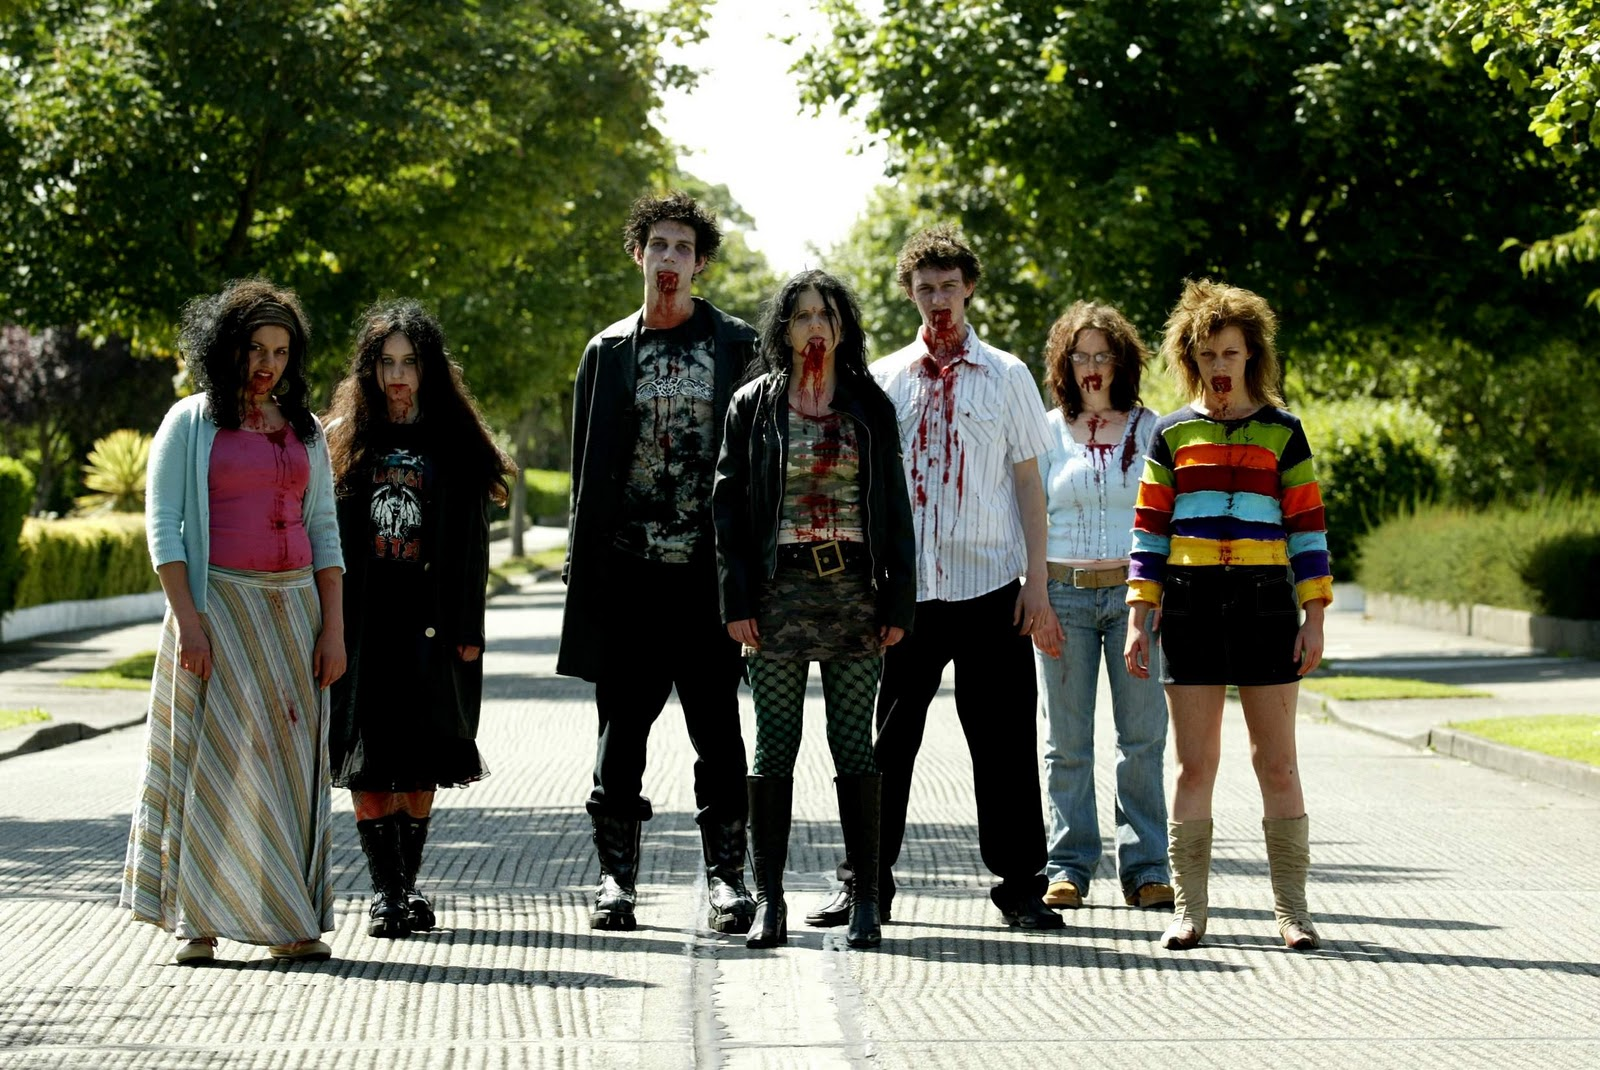 Horror And Zombie Film Reviews Movie Reviews Horror Videogame Reviews Boy Eats Girl 2005 Zombie Film Review